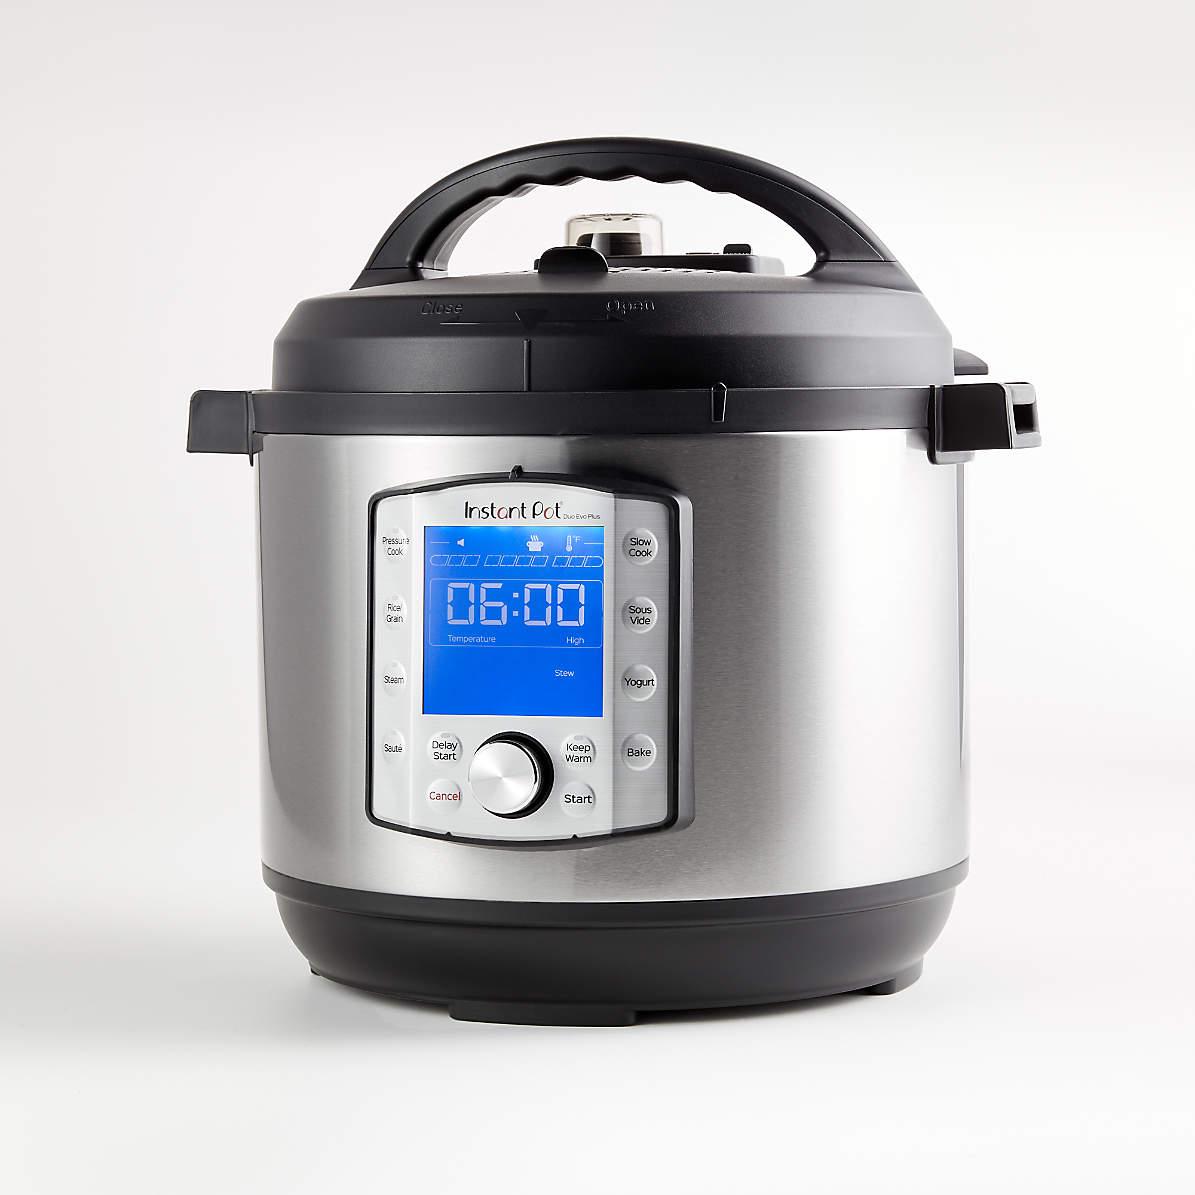 3,6,8 Quart Pressure Cooker Genuine Instant Pot Stainless Steel Inner Cooking